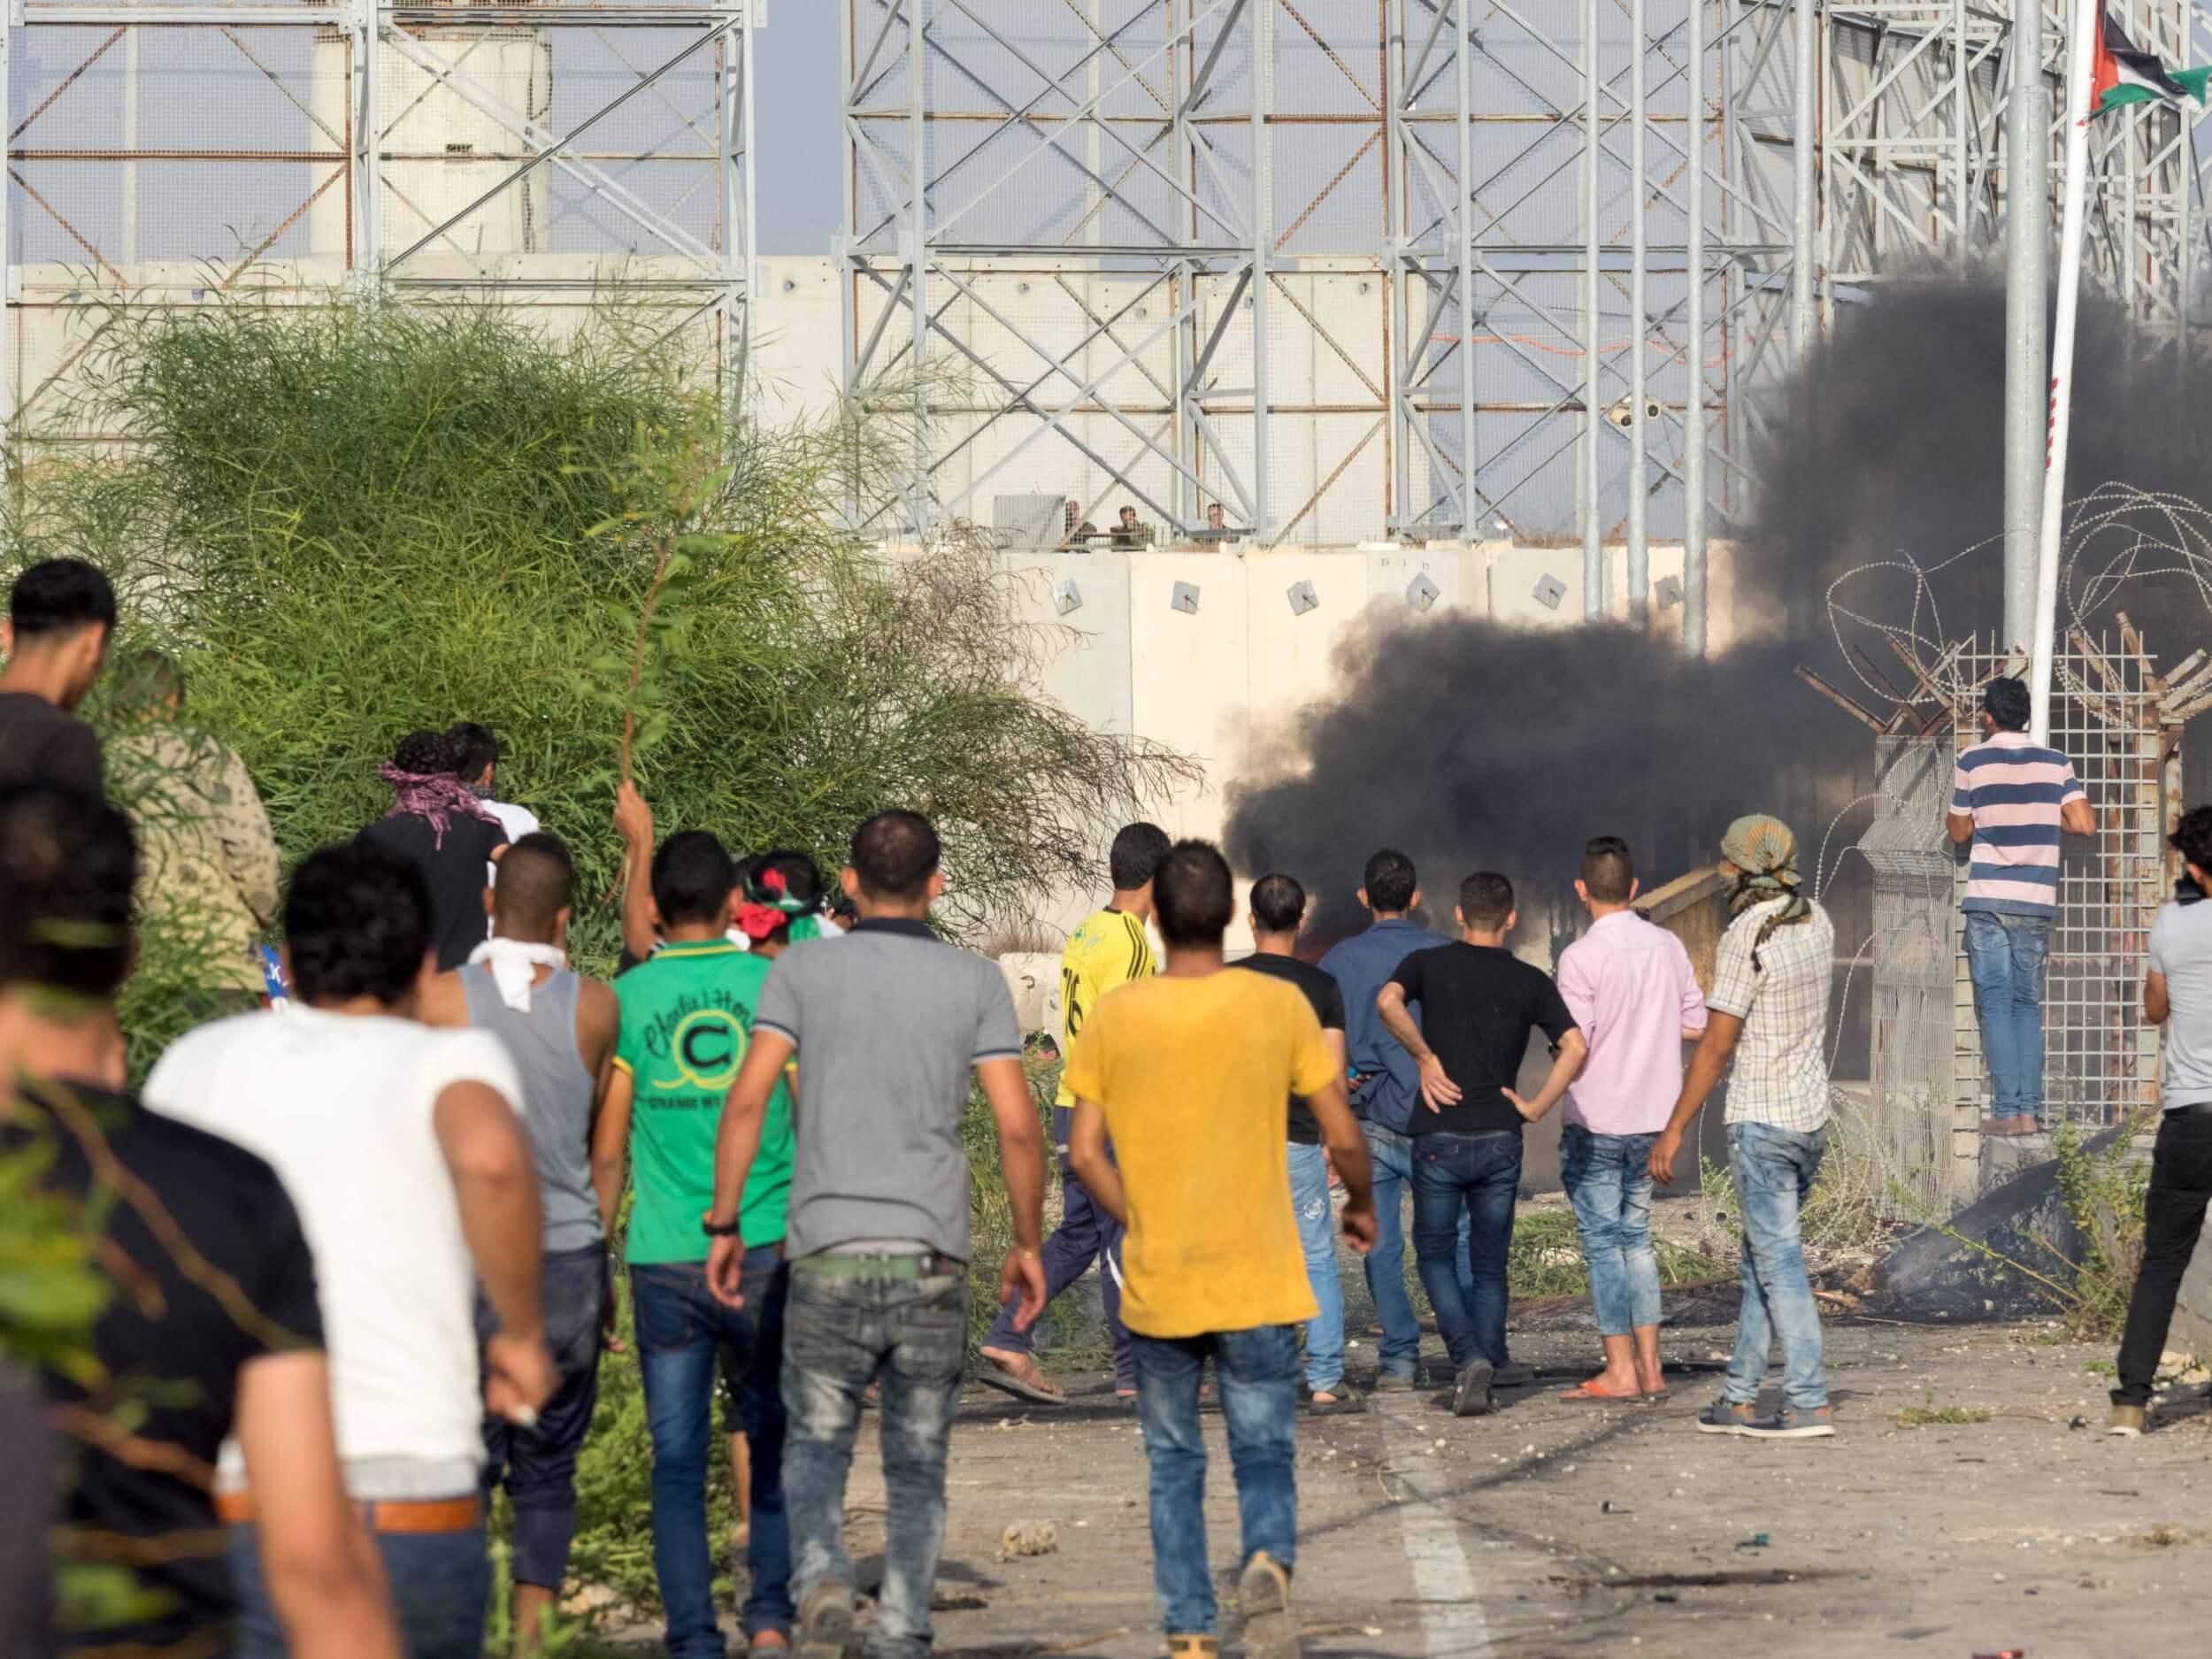 Israeli soldiers look down on Palestinian protestors in Gaza. (Photo: Dan Cohen)